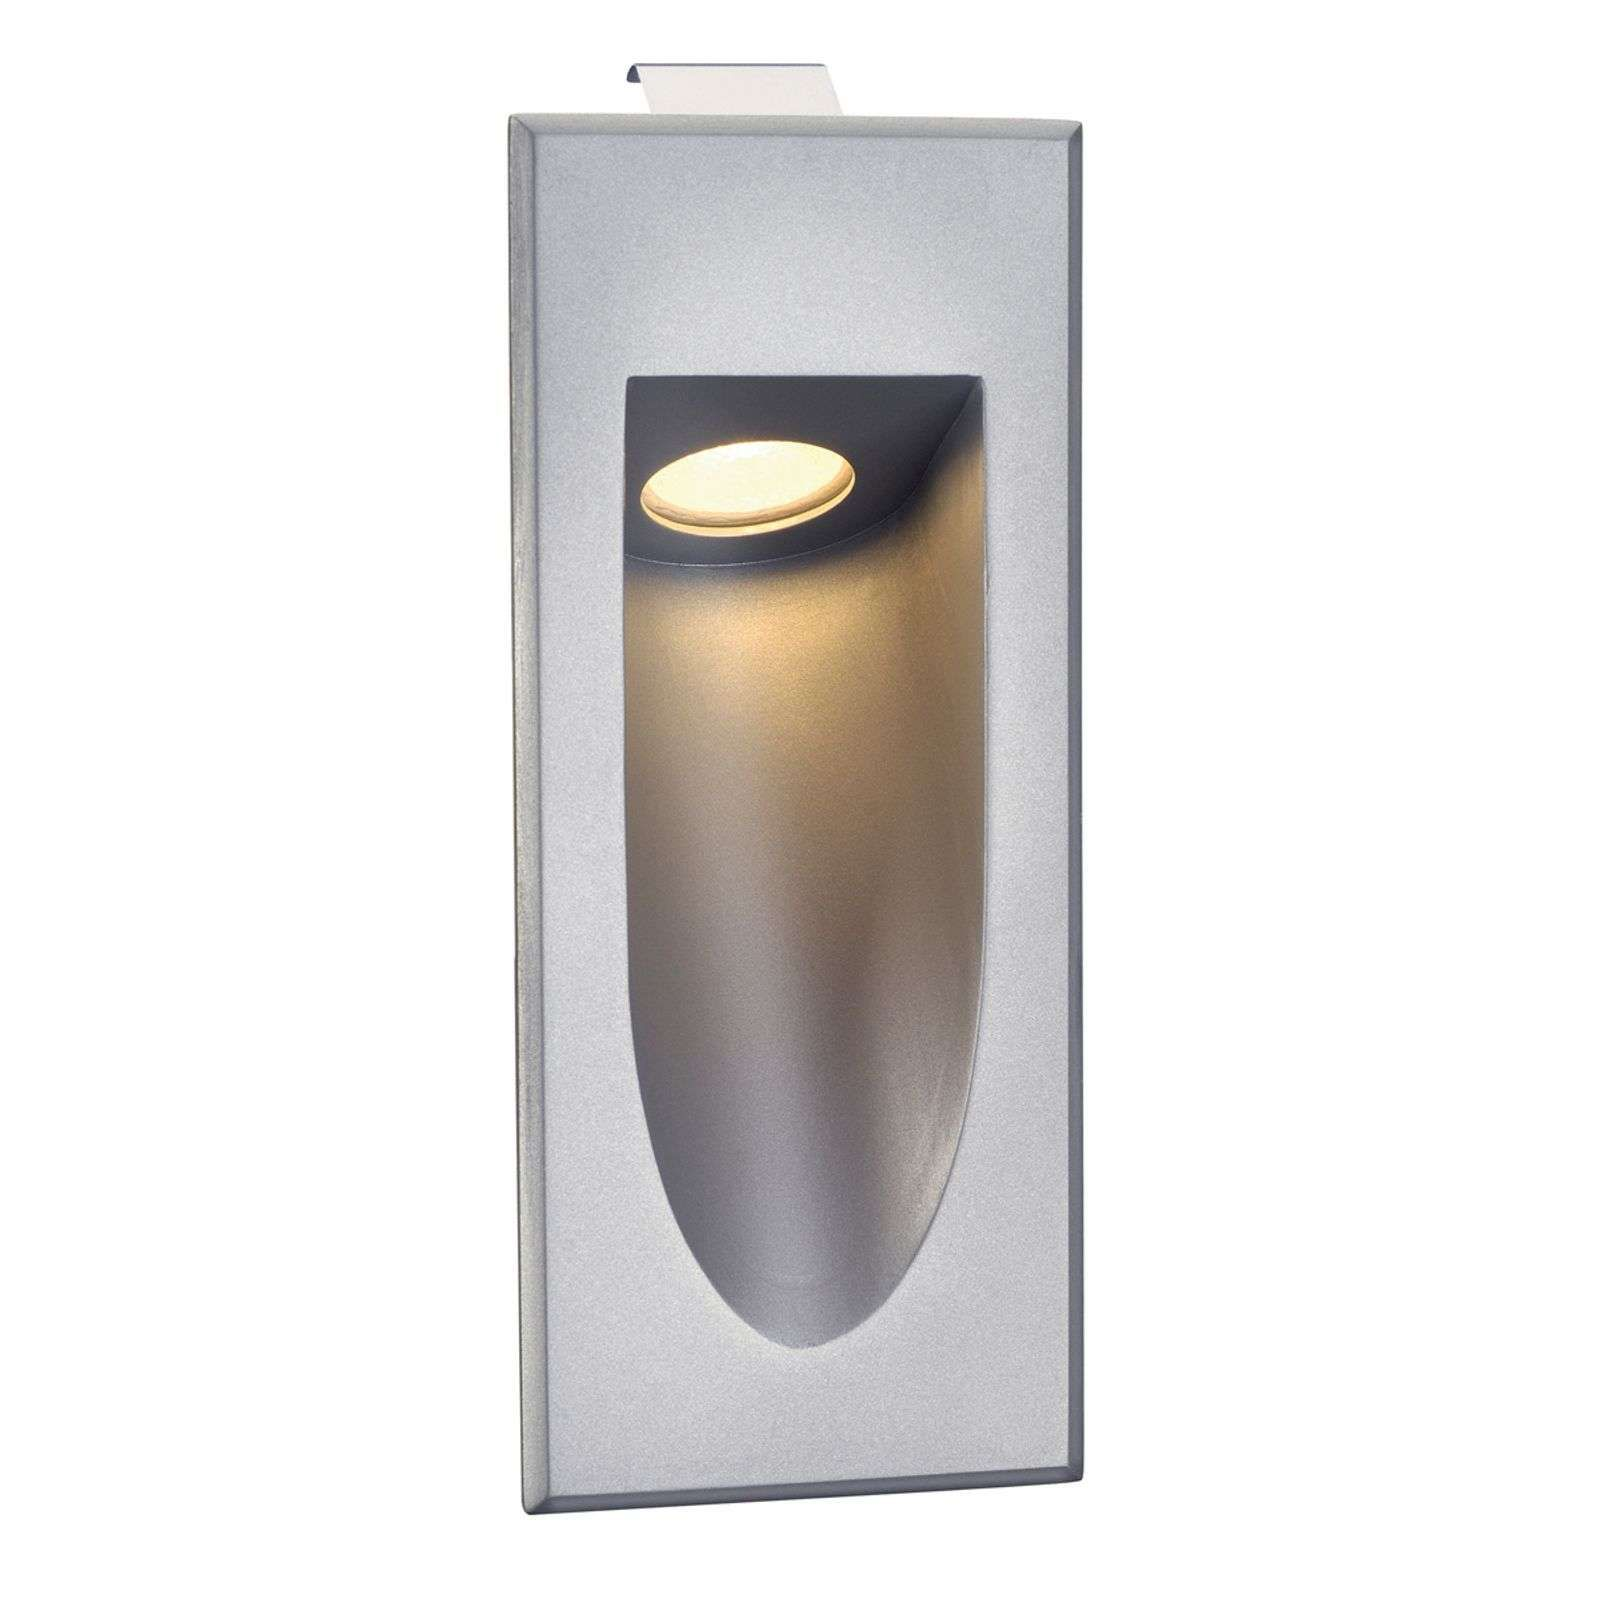 Dimbare Led Spots Gu10 Praxis Led Inbouwspots Binnen Led Spot Gu10 Dimmbar Philips Spotjes 220 Volt Spotjes Badkamer Dimbaar In 2020 Led Wandlamp Wit